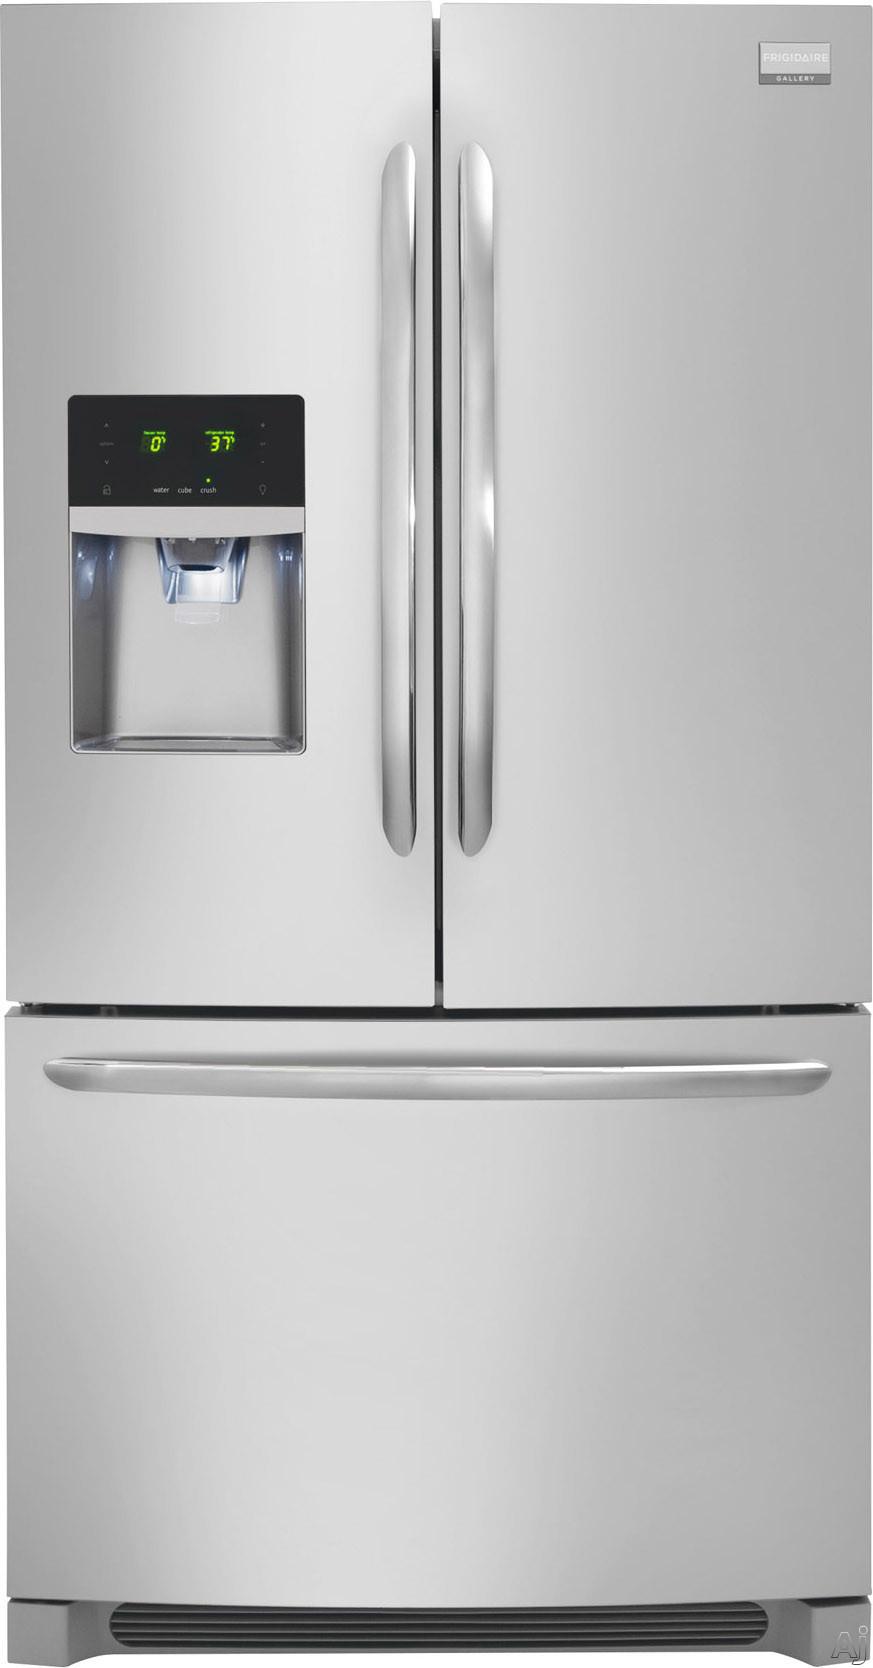 Frigidaire Refrigeration,Frigidaire Refrigerators,Frigidaire French Door Refrigerators